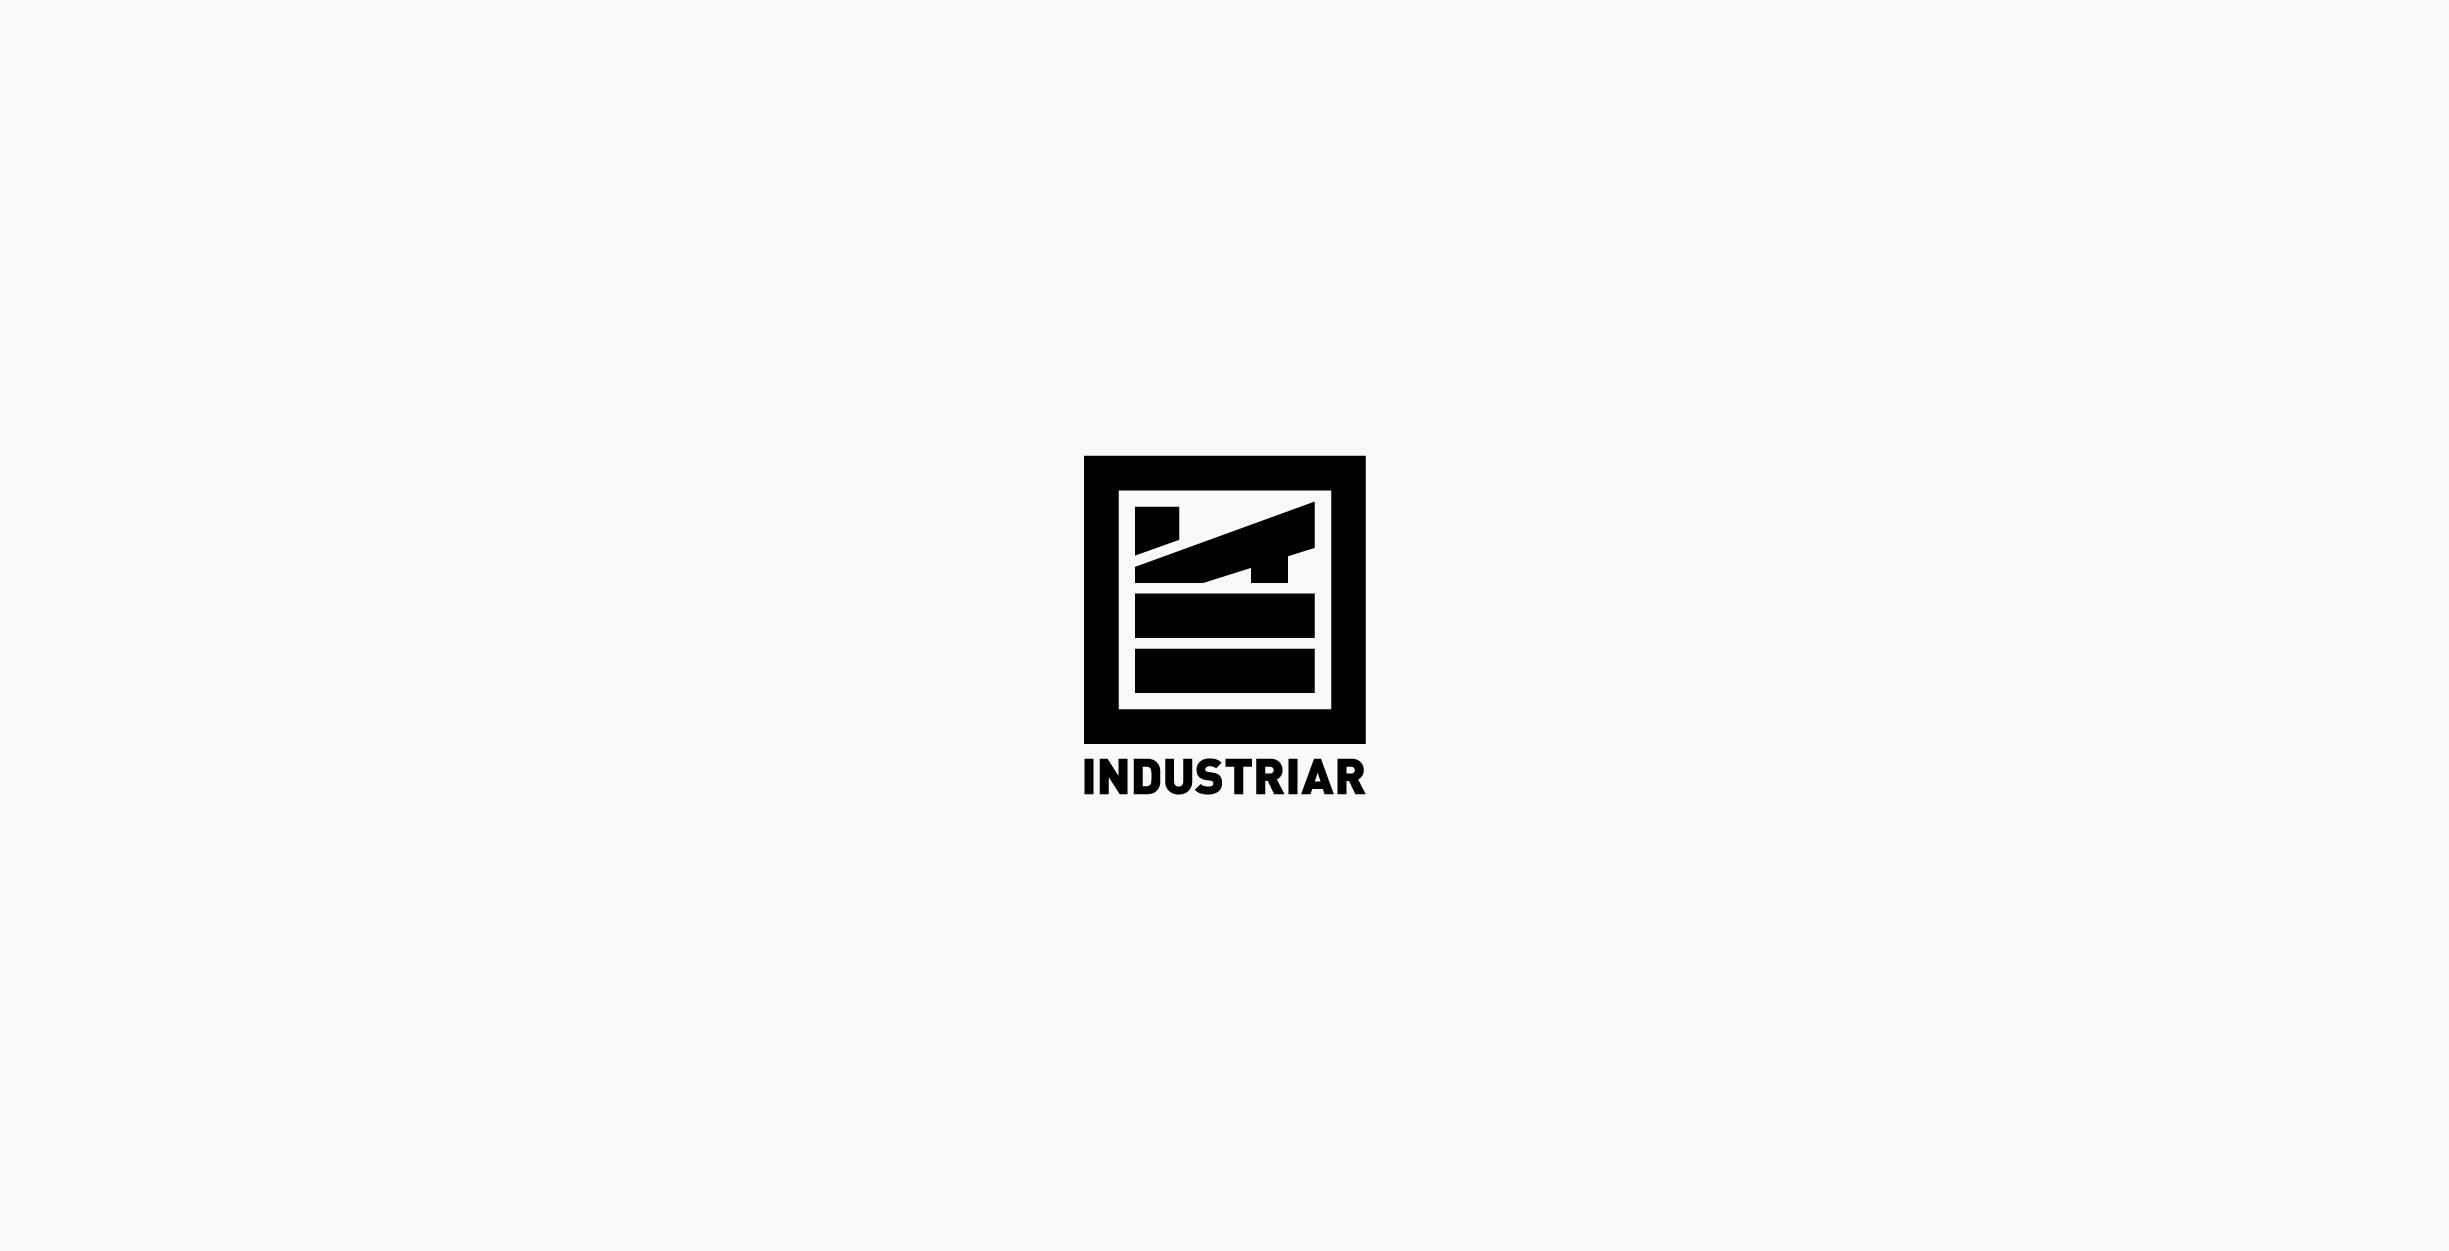 logos-2-v4-27